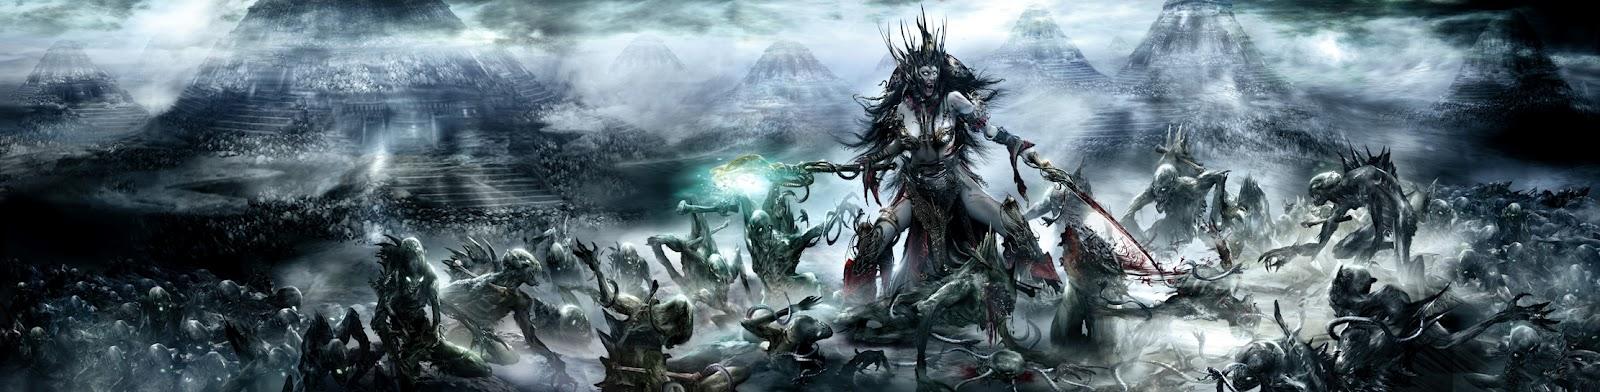 [Time of Legends] Neferata de Josh Reynolds- The Blood of Nagash I 173923nefetara1